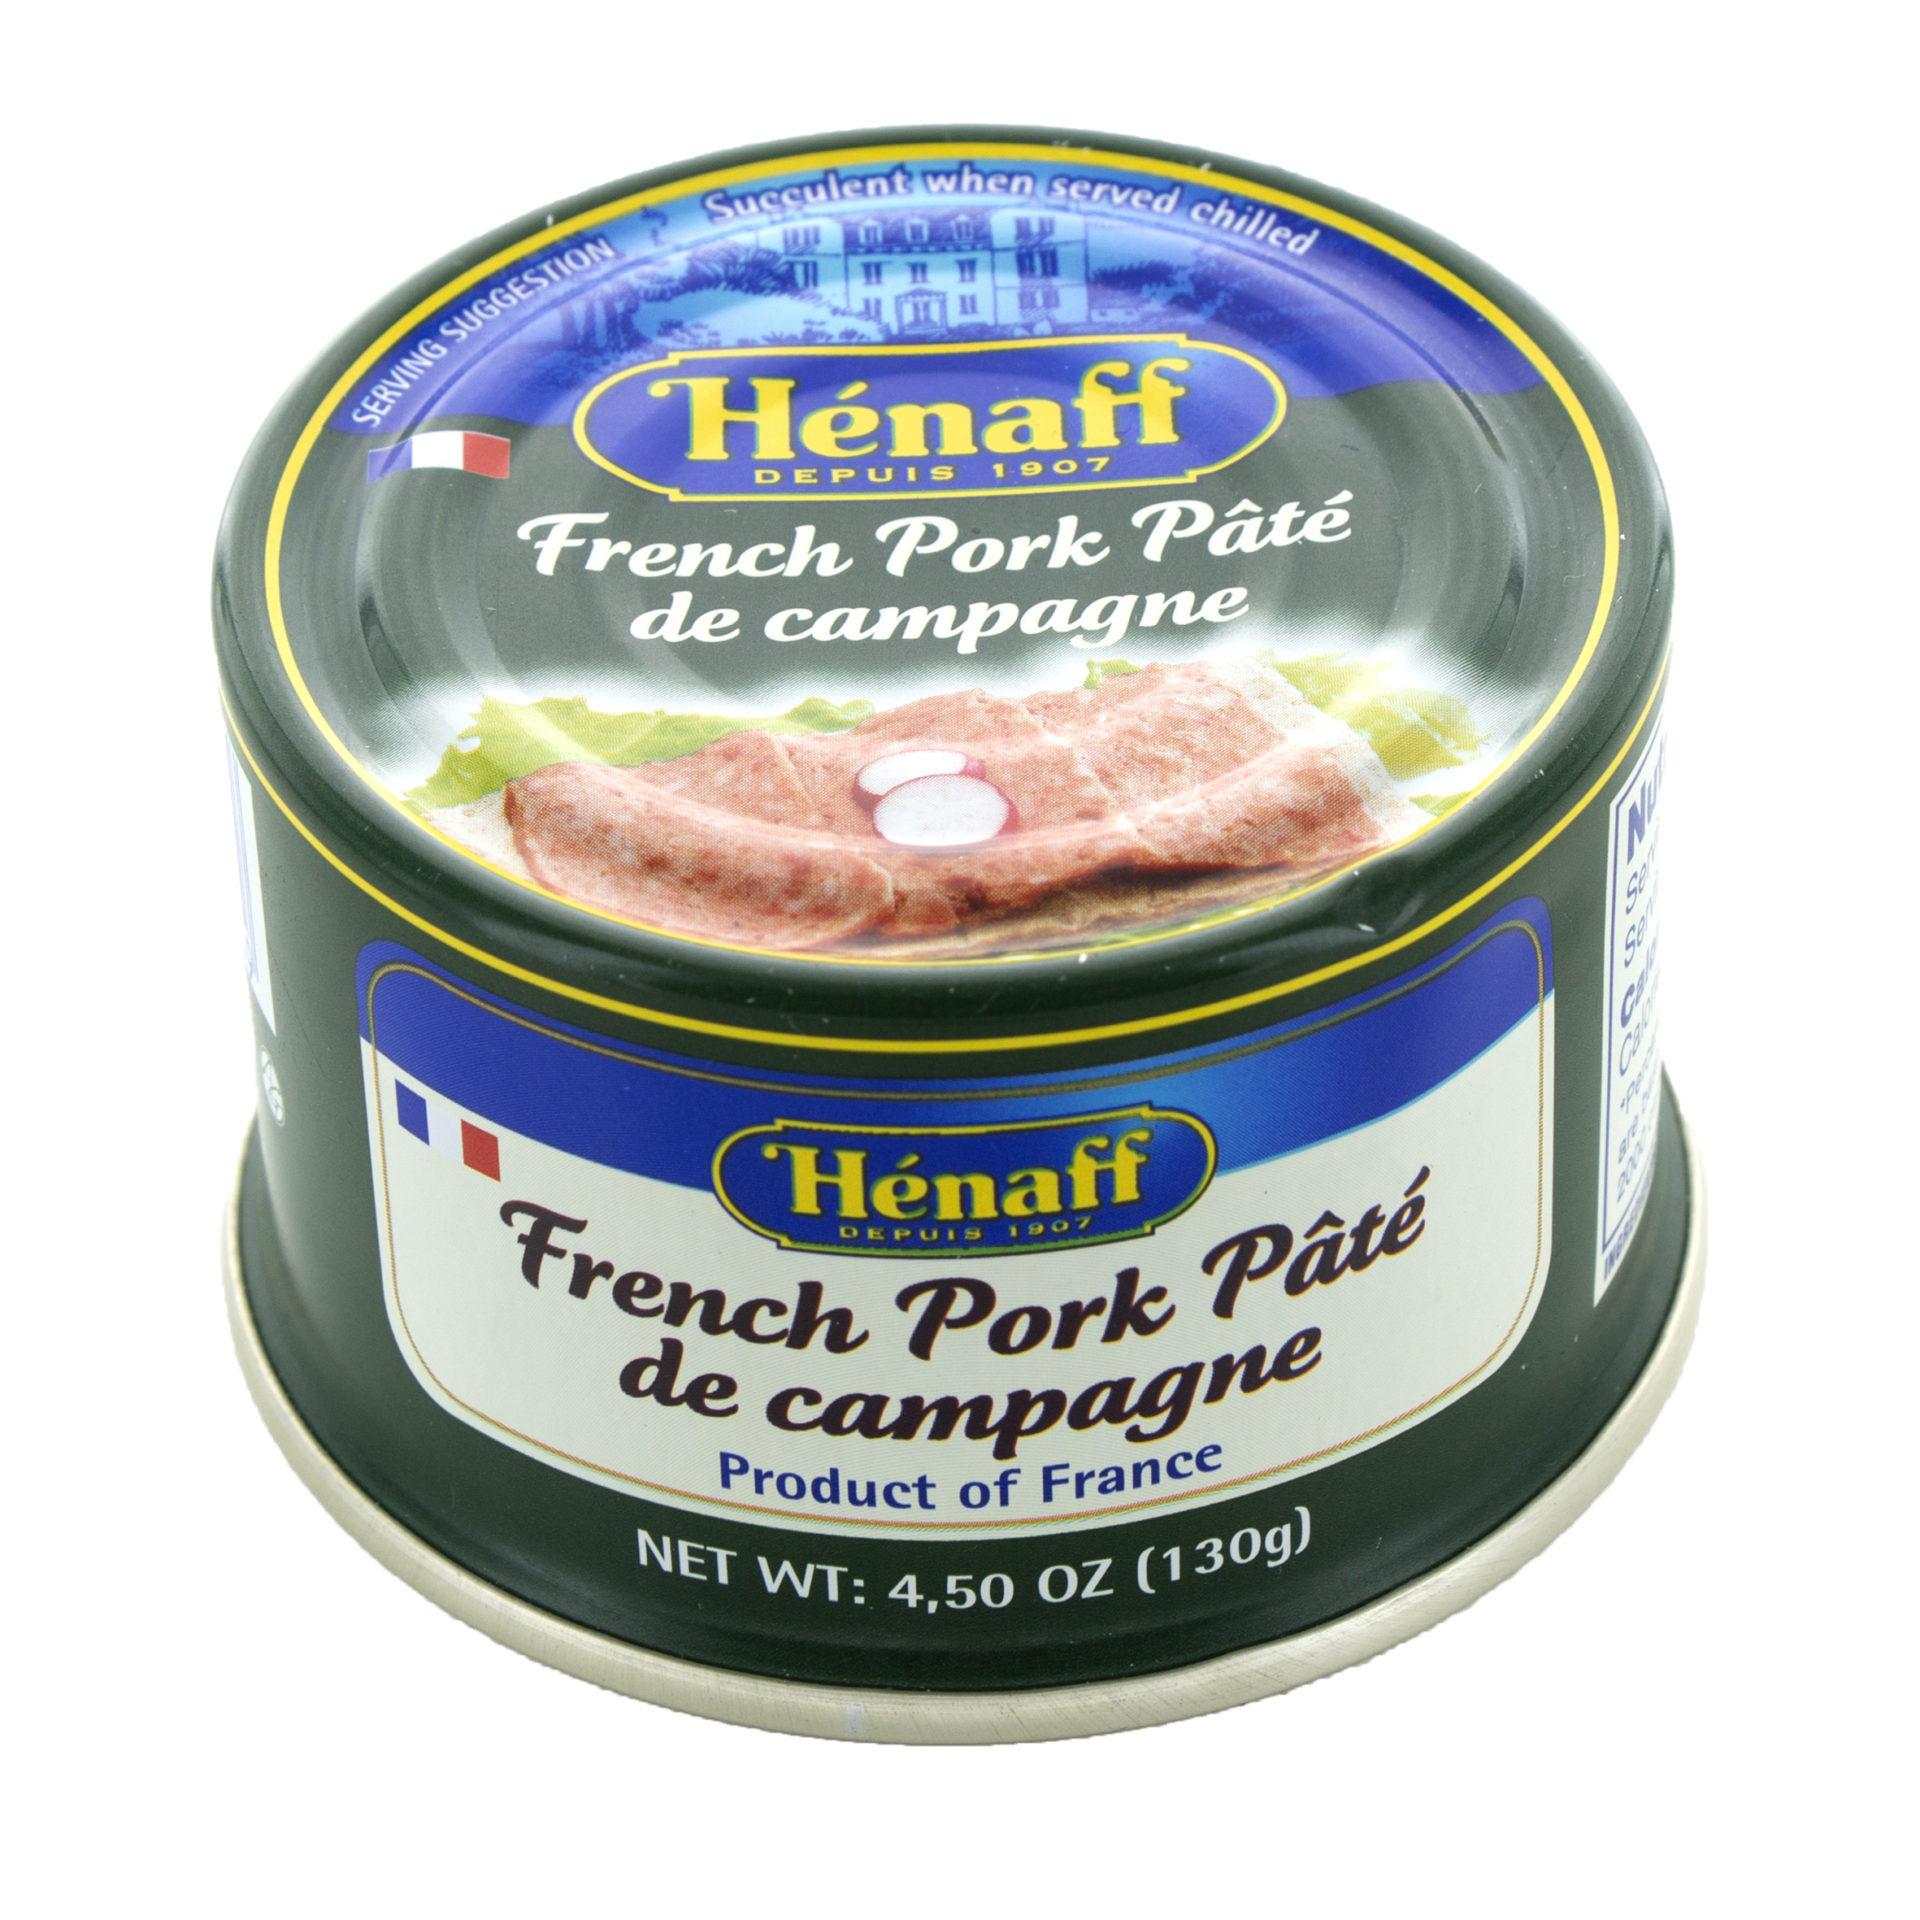 French Pork Pâté de campagne